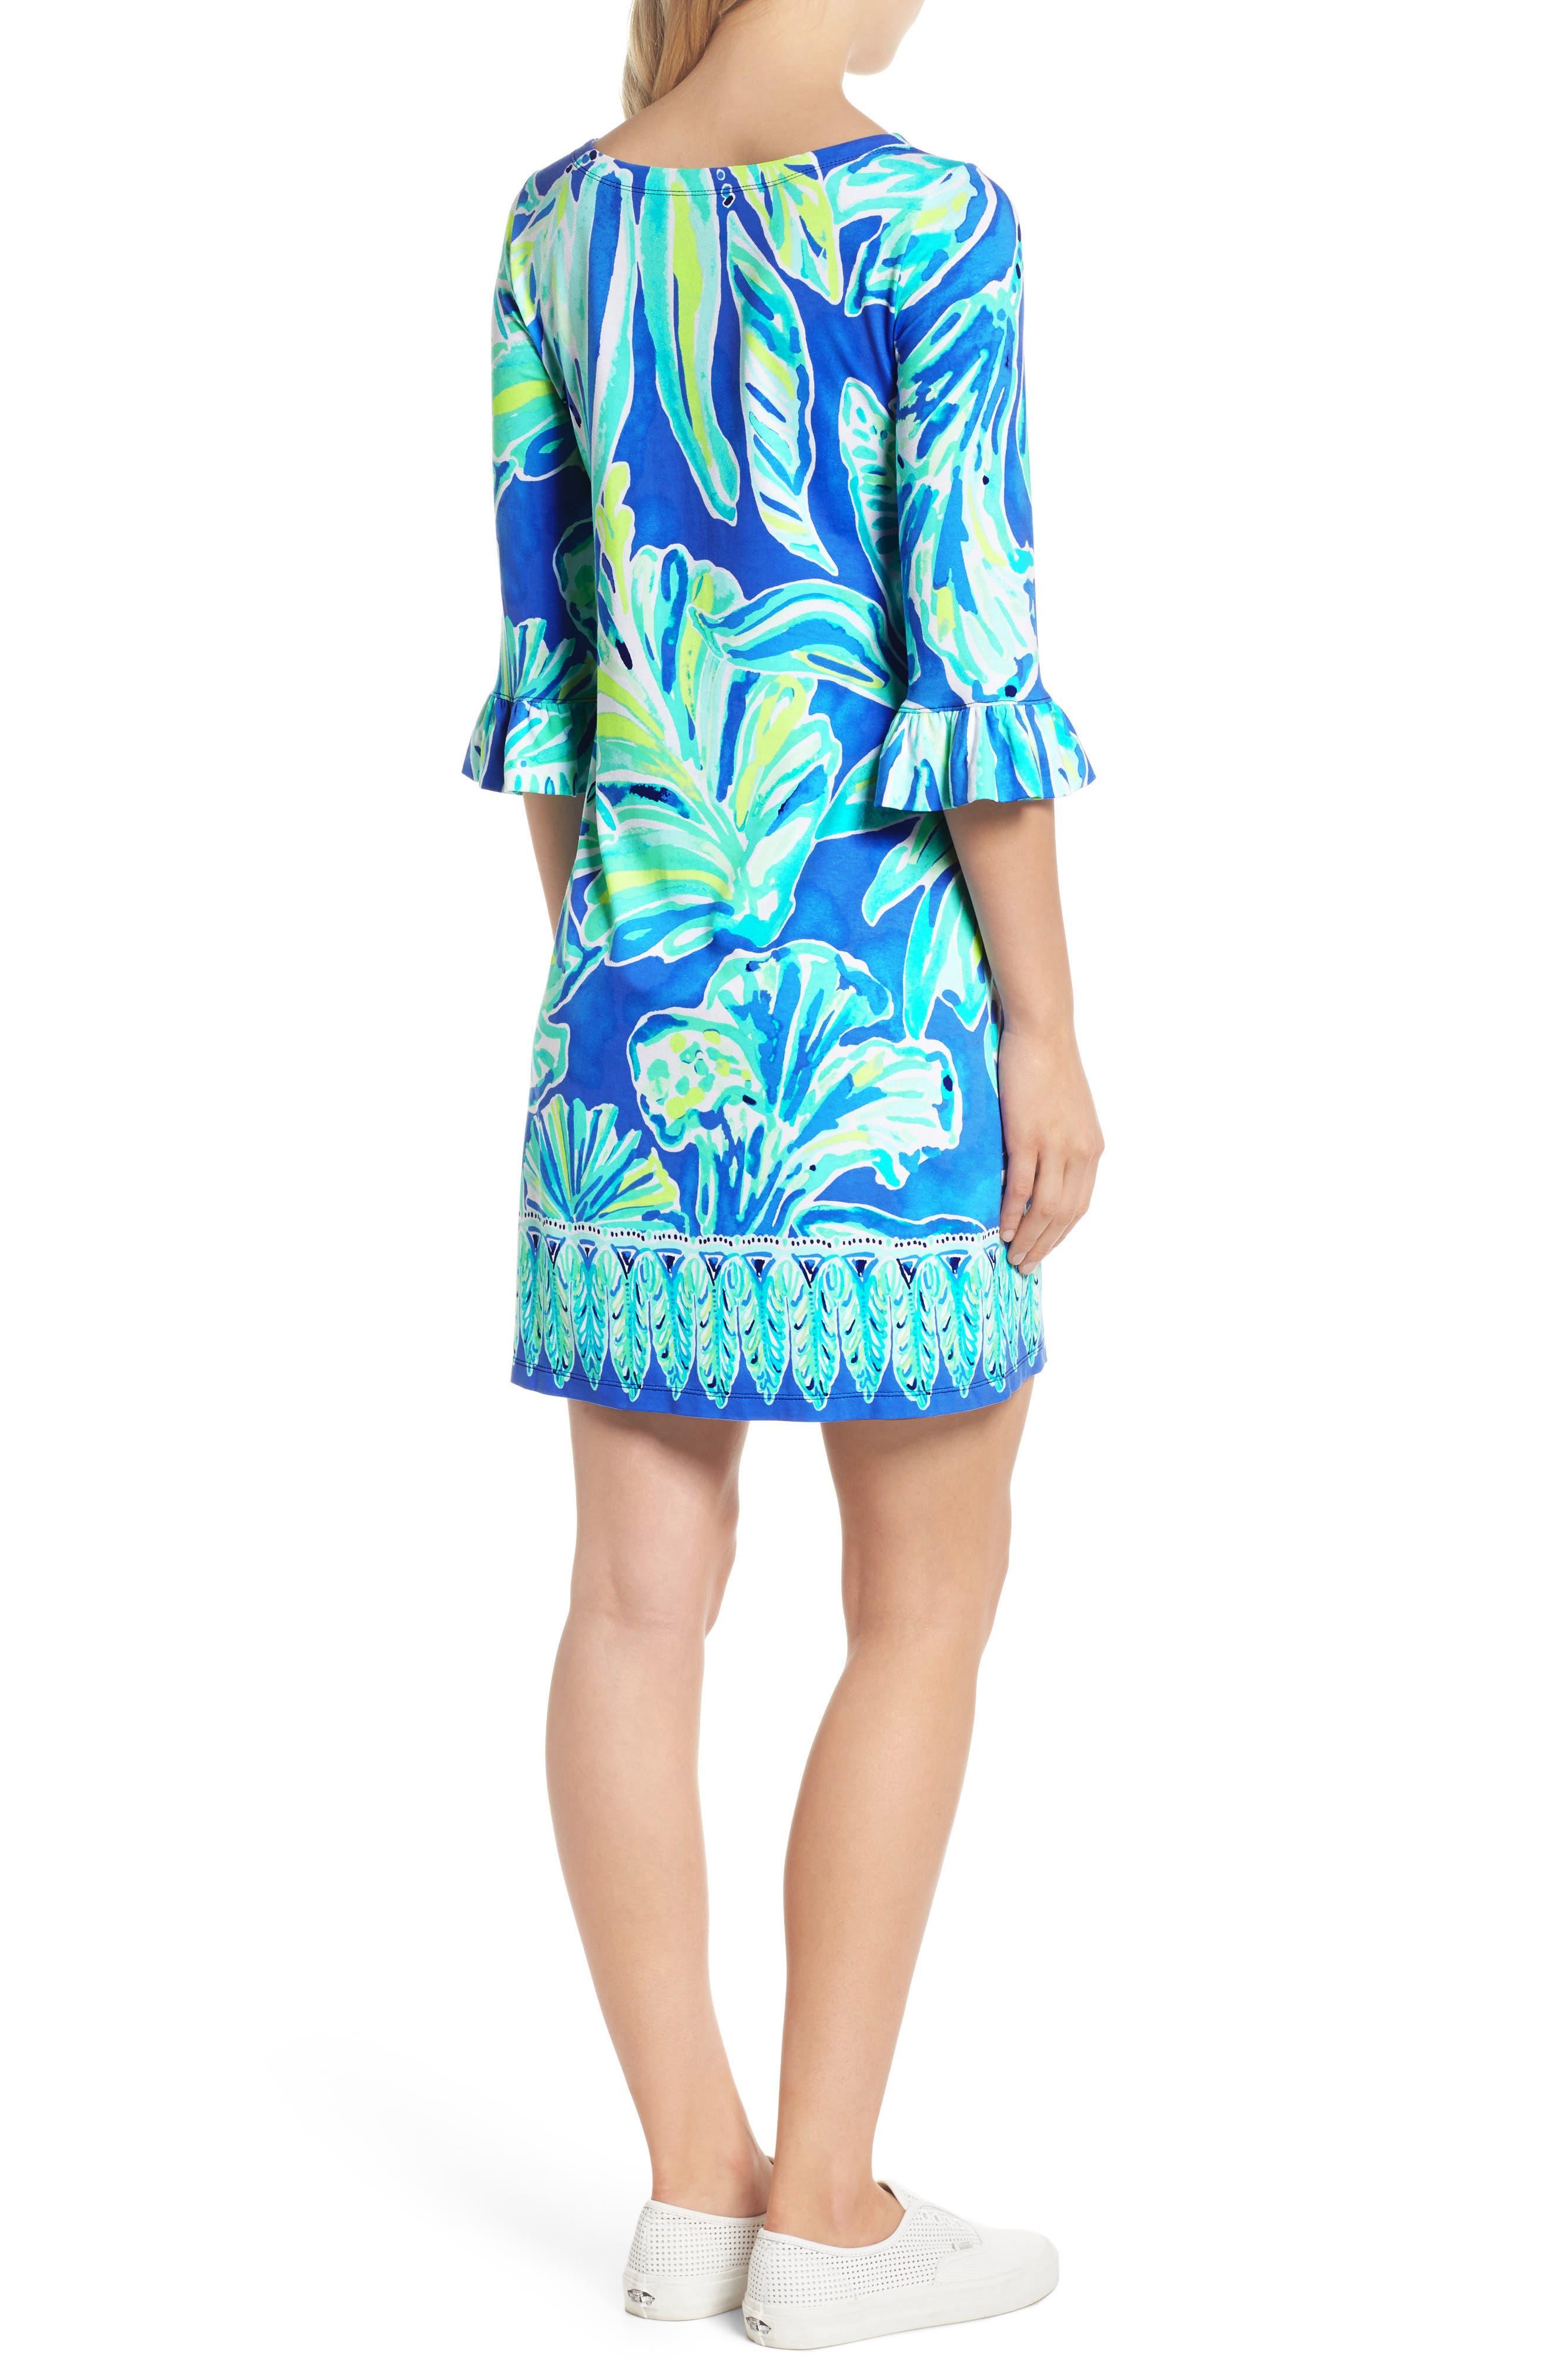 Sophie UPF 50+ Shift Dress,                             Alternate thumbnail 2, color,                             Beckon Blue Palm Passage